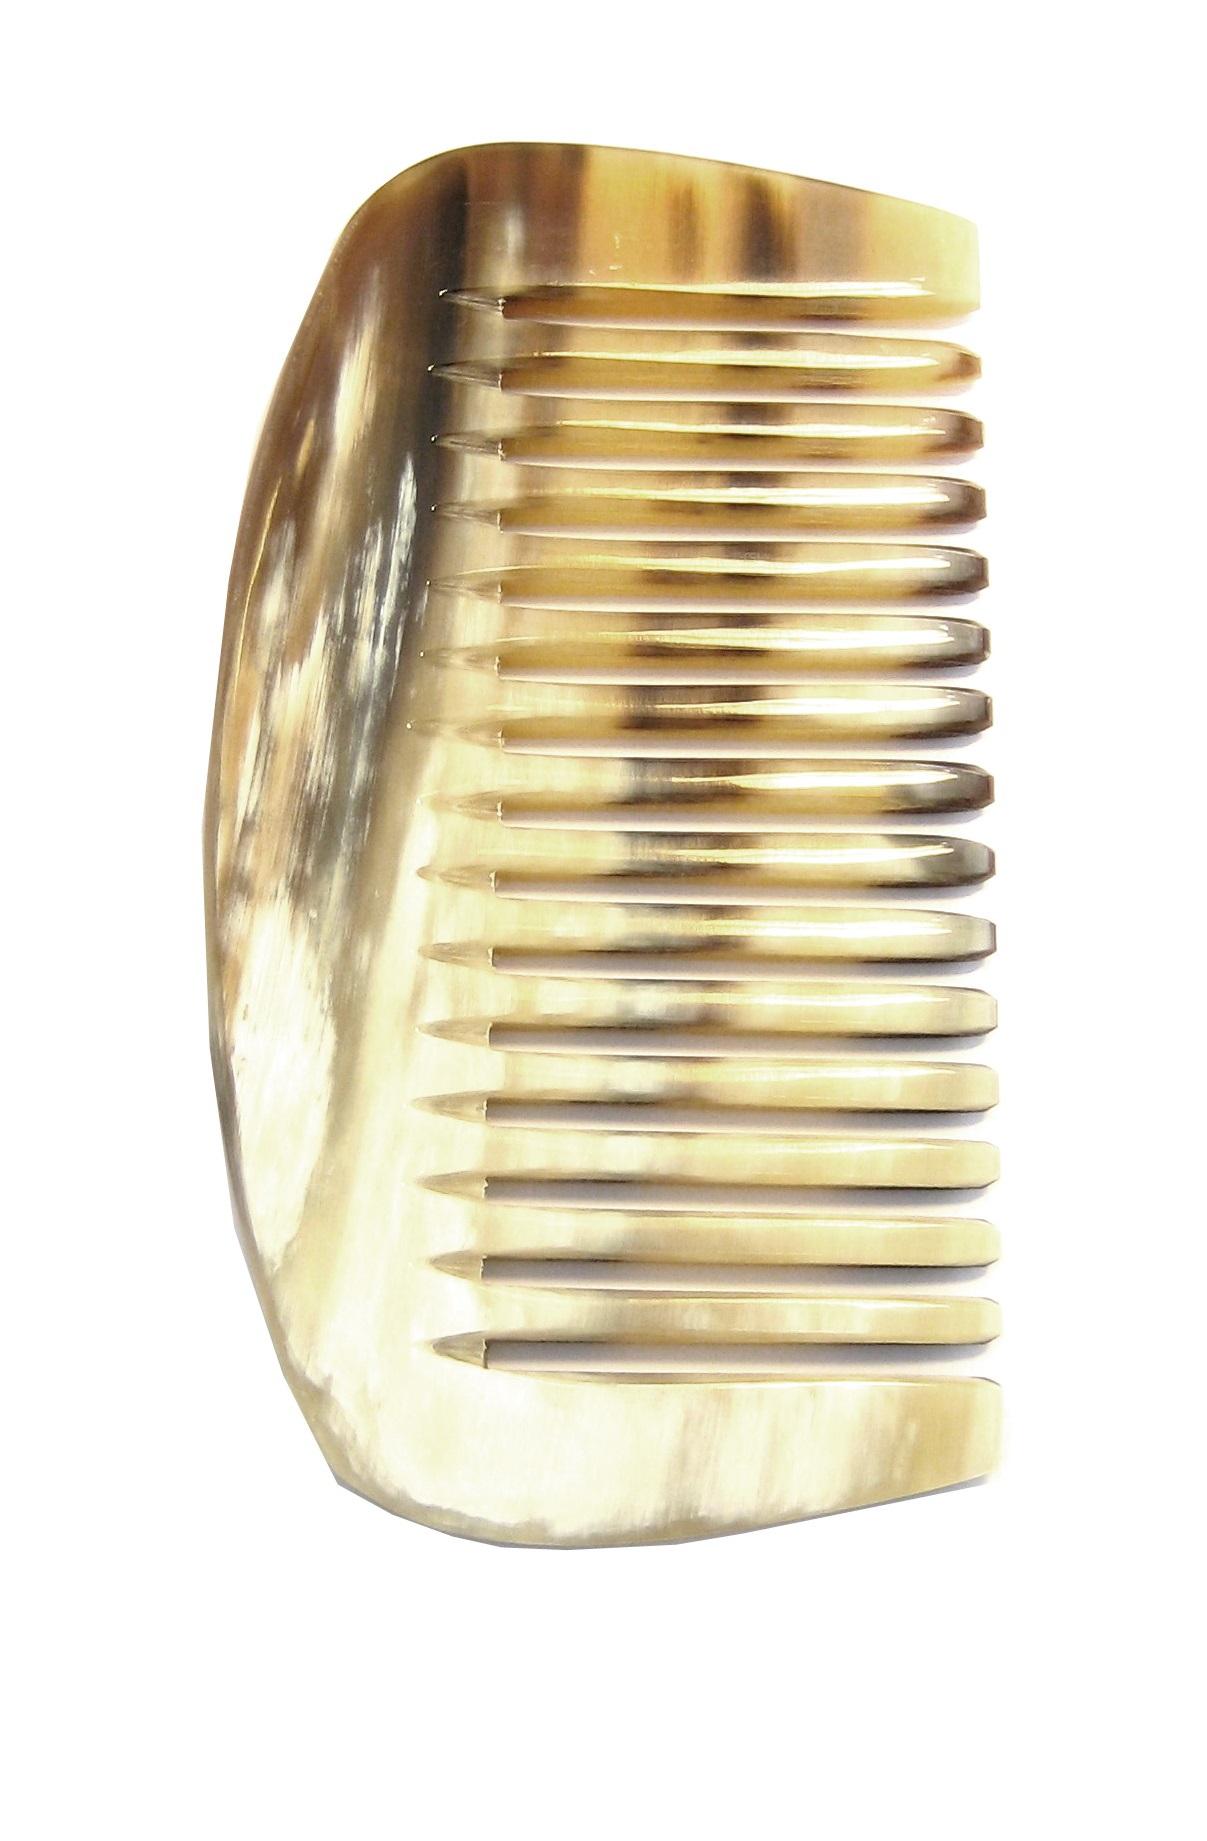 Golddachs Afrokamm aus handgesägtem Horn